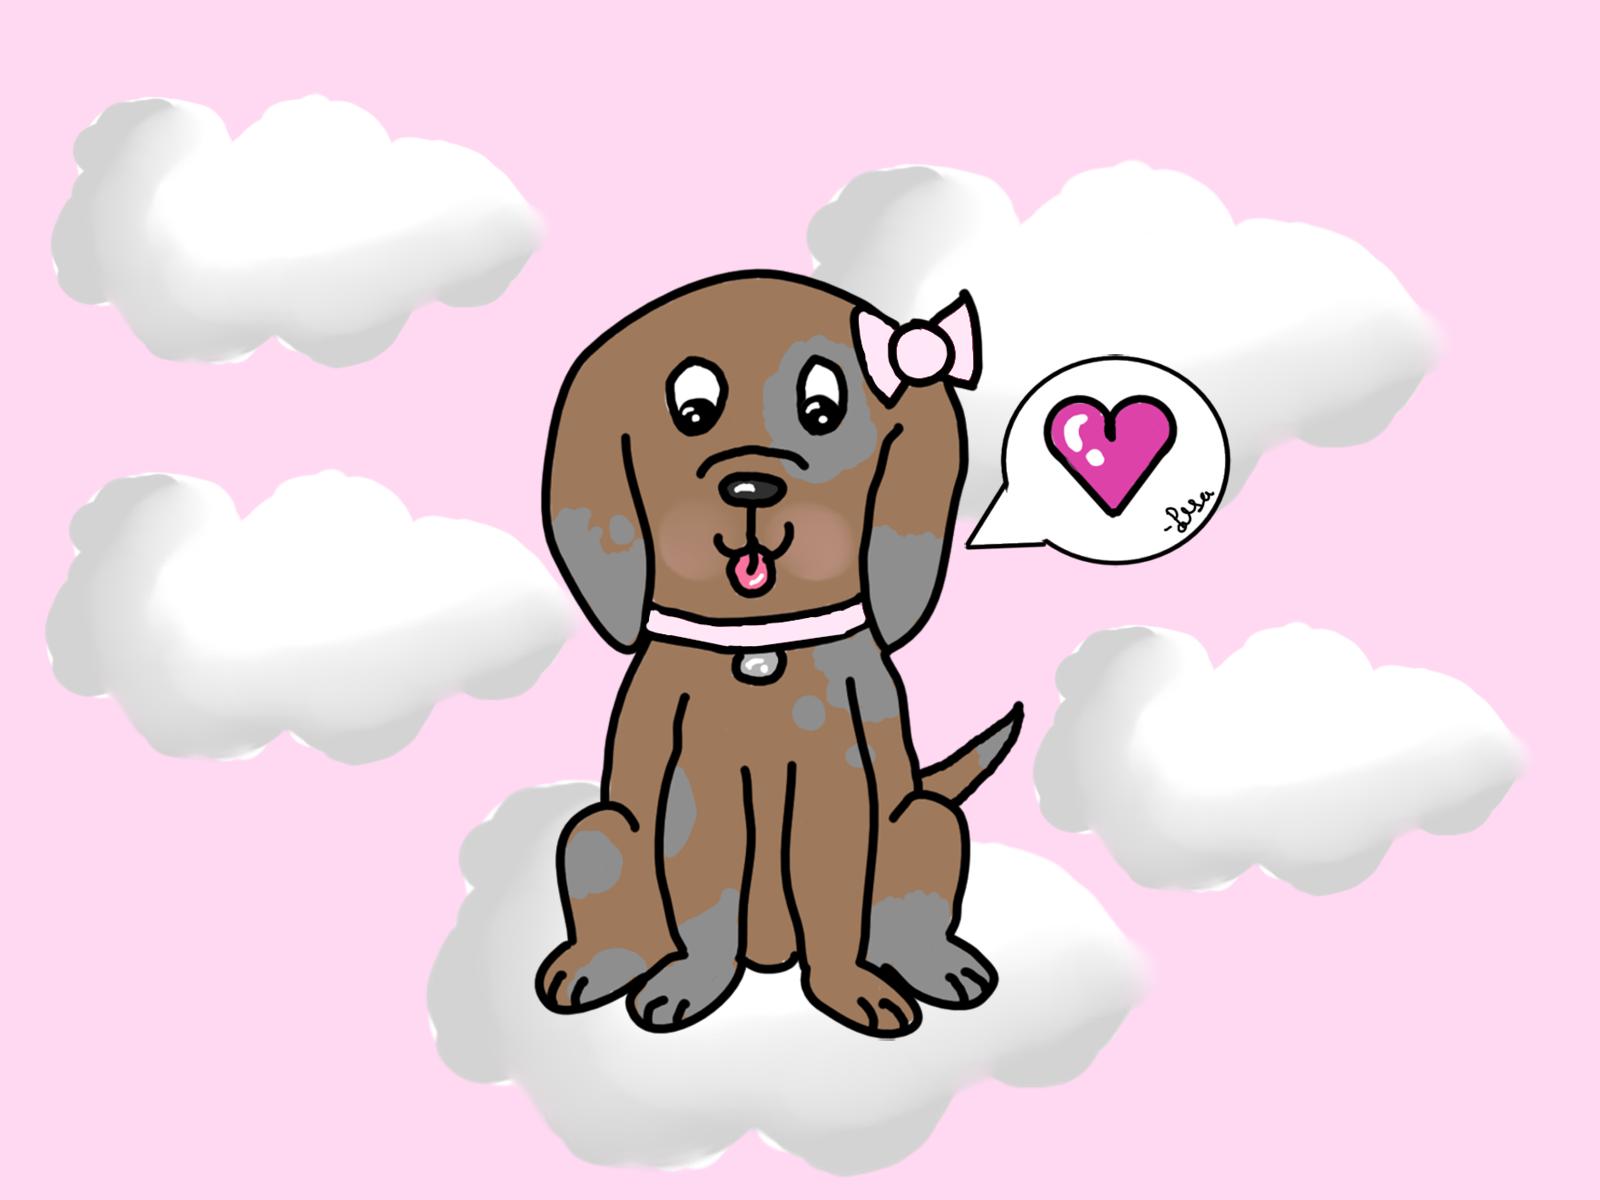 cute dog bg transparnet.png